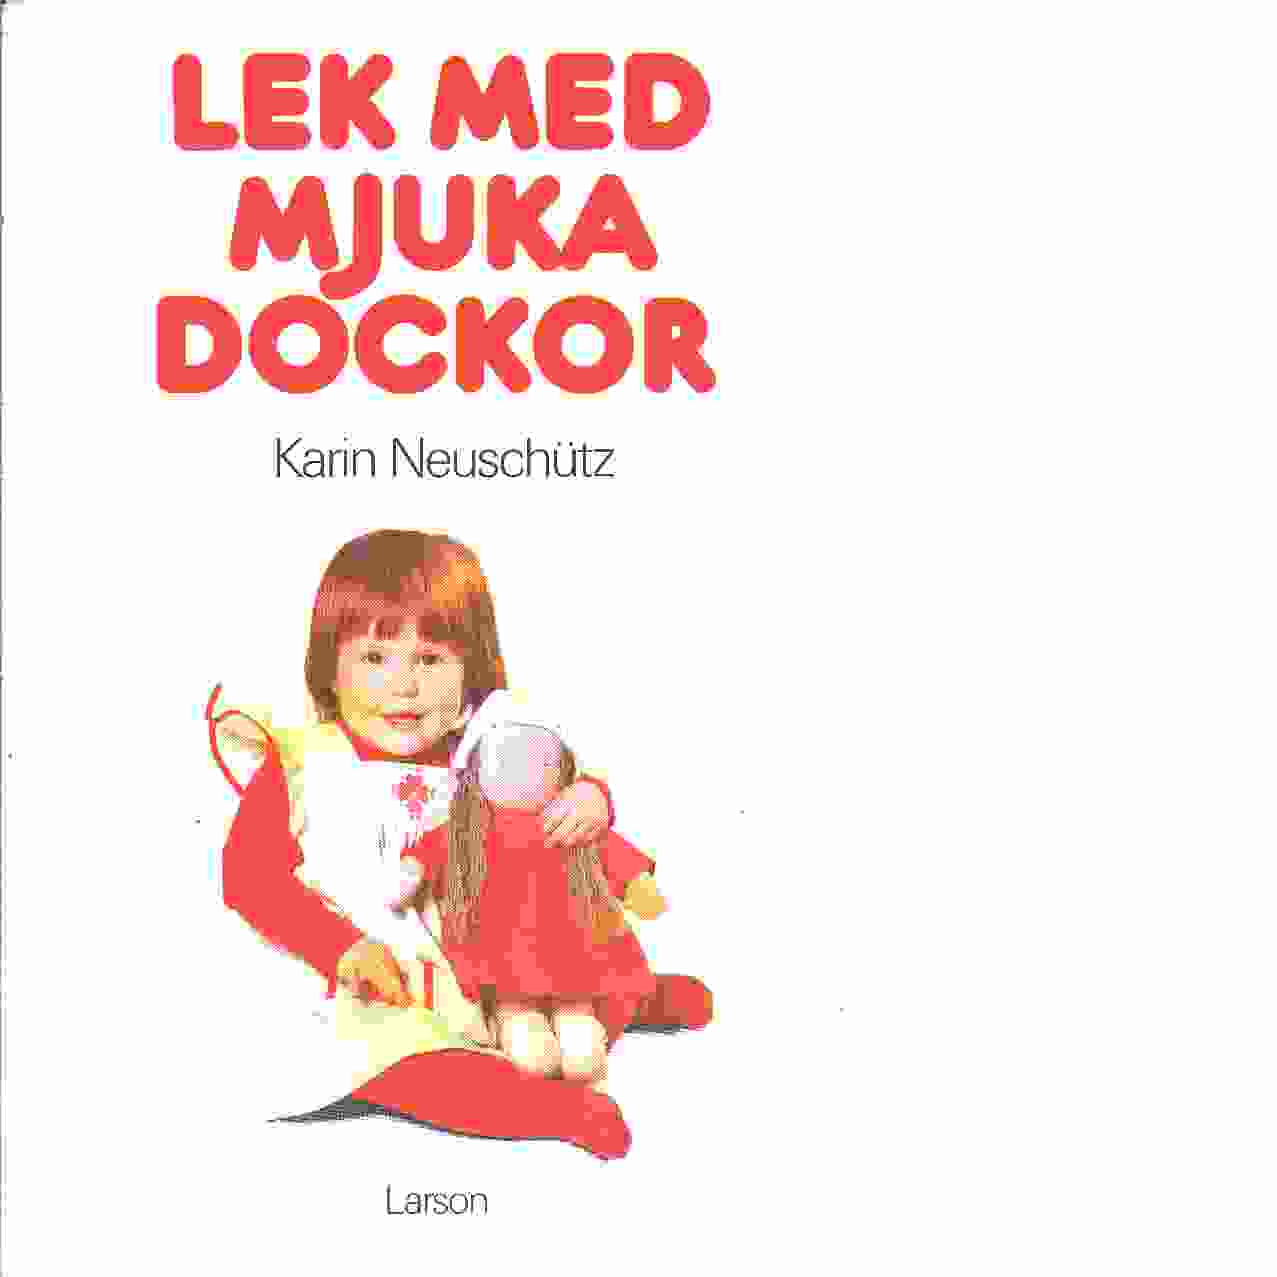 Lek med mjuka dockor - Neuschütz, Karin